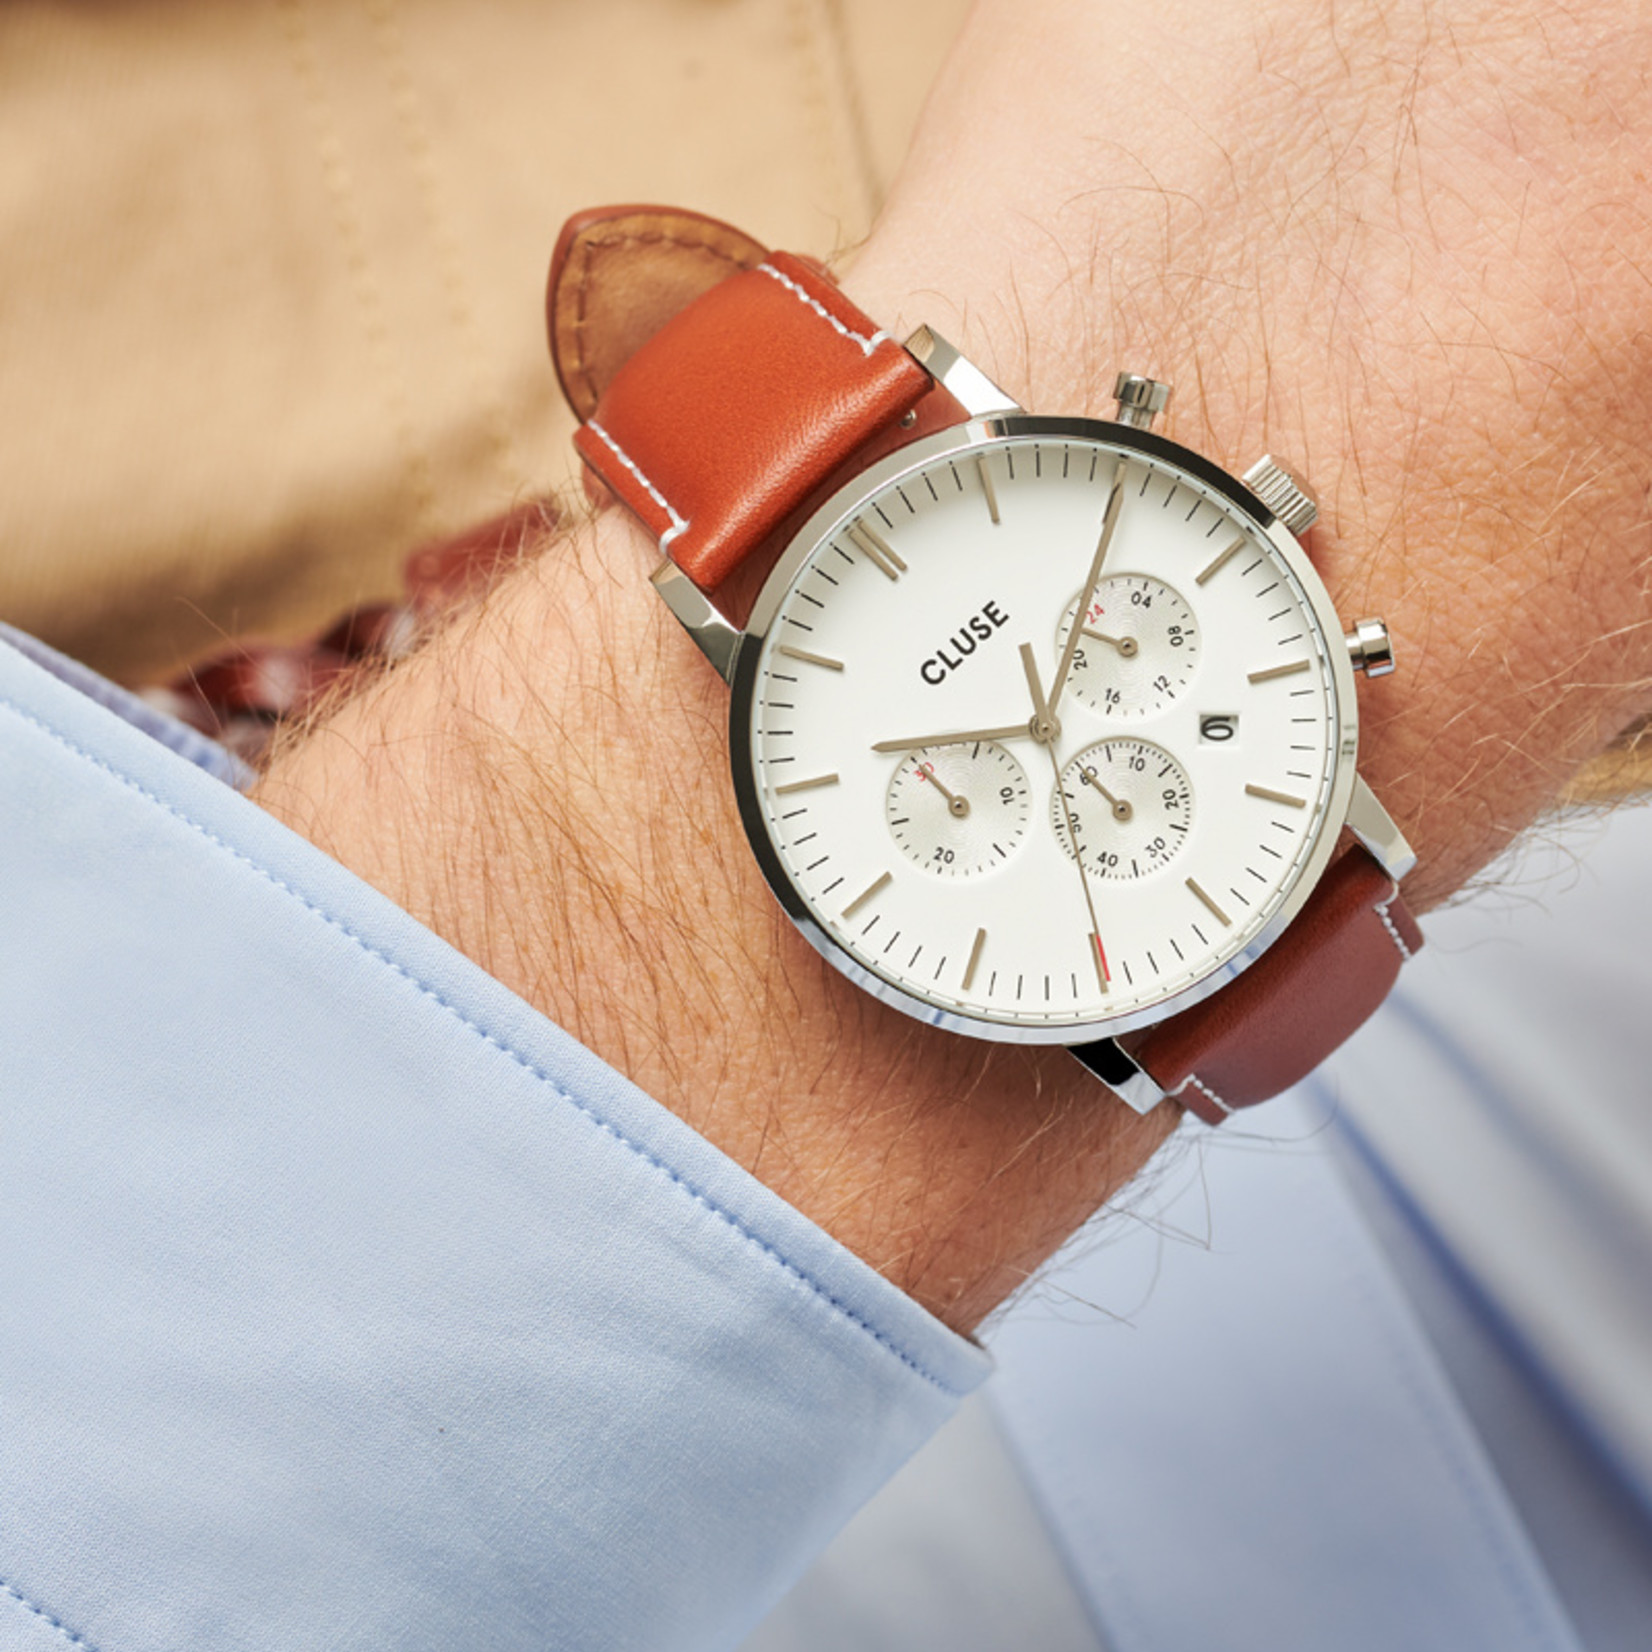 Cluse Cluse Uhr Aravis hellbraun-weiß I Chronograph I Leder